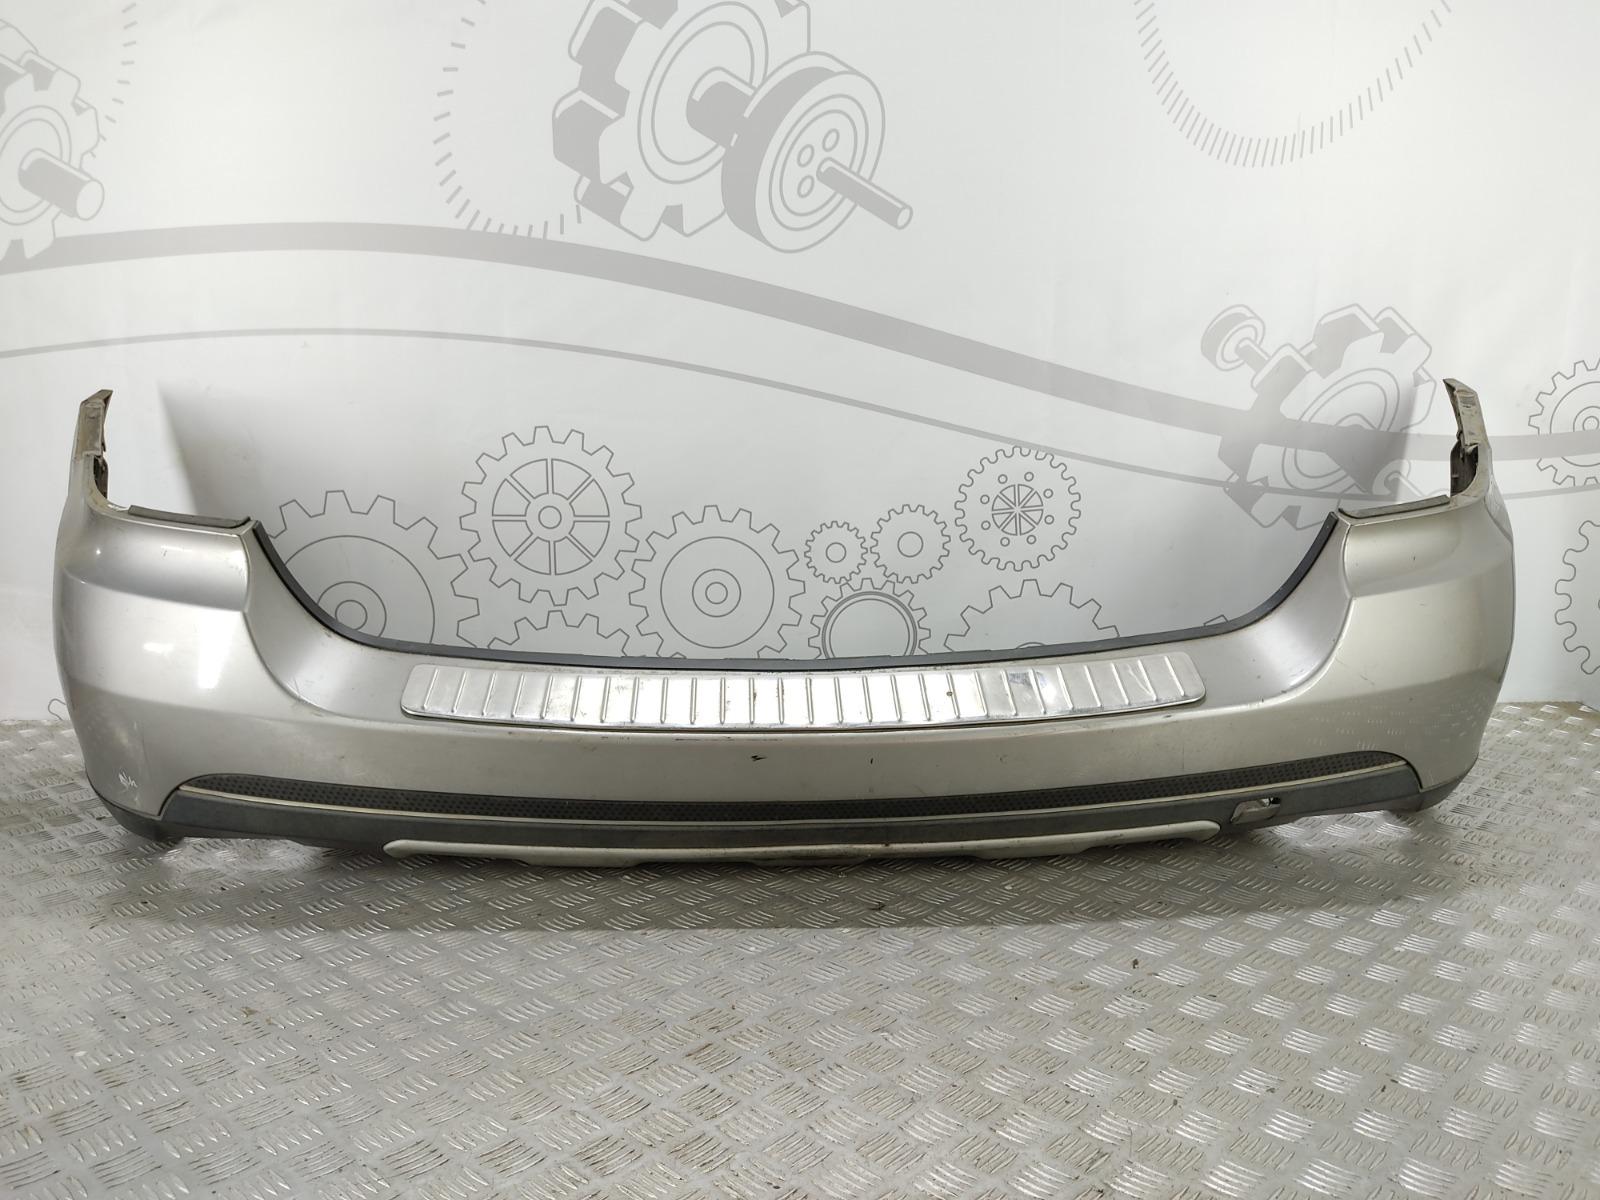 Бампер задний Mercedes Ml W164 3.0 CDI 2006 (б/у)